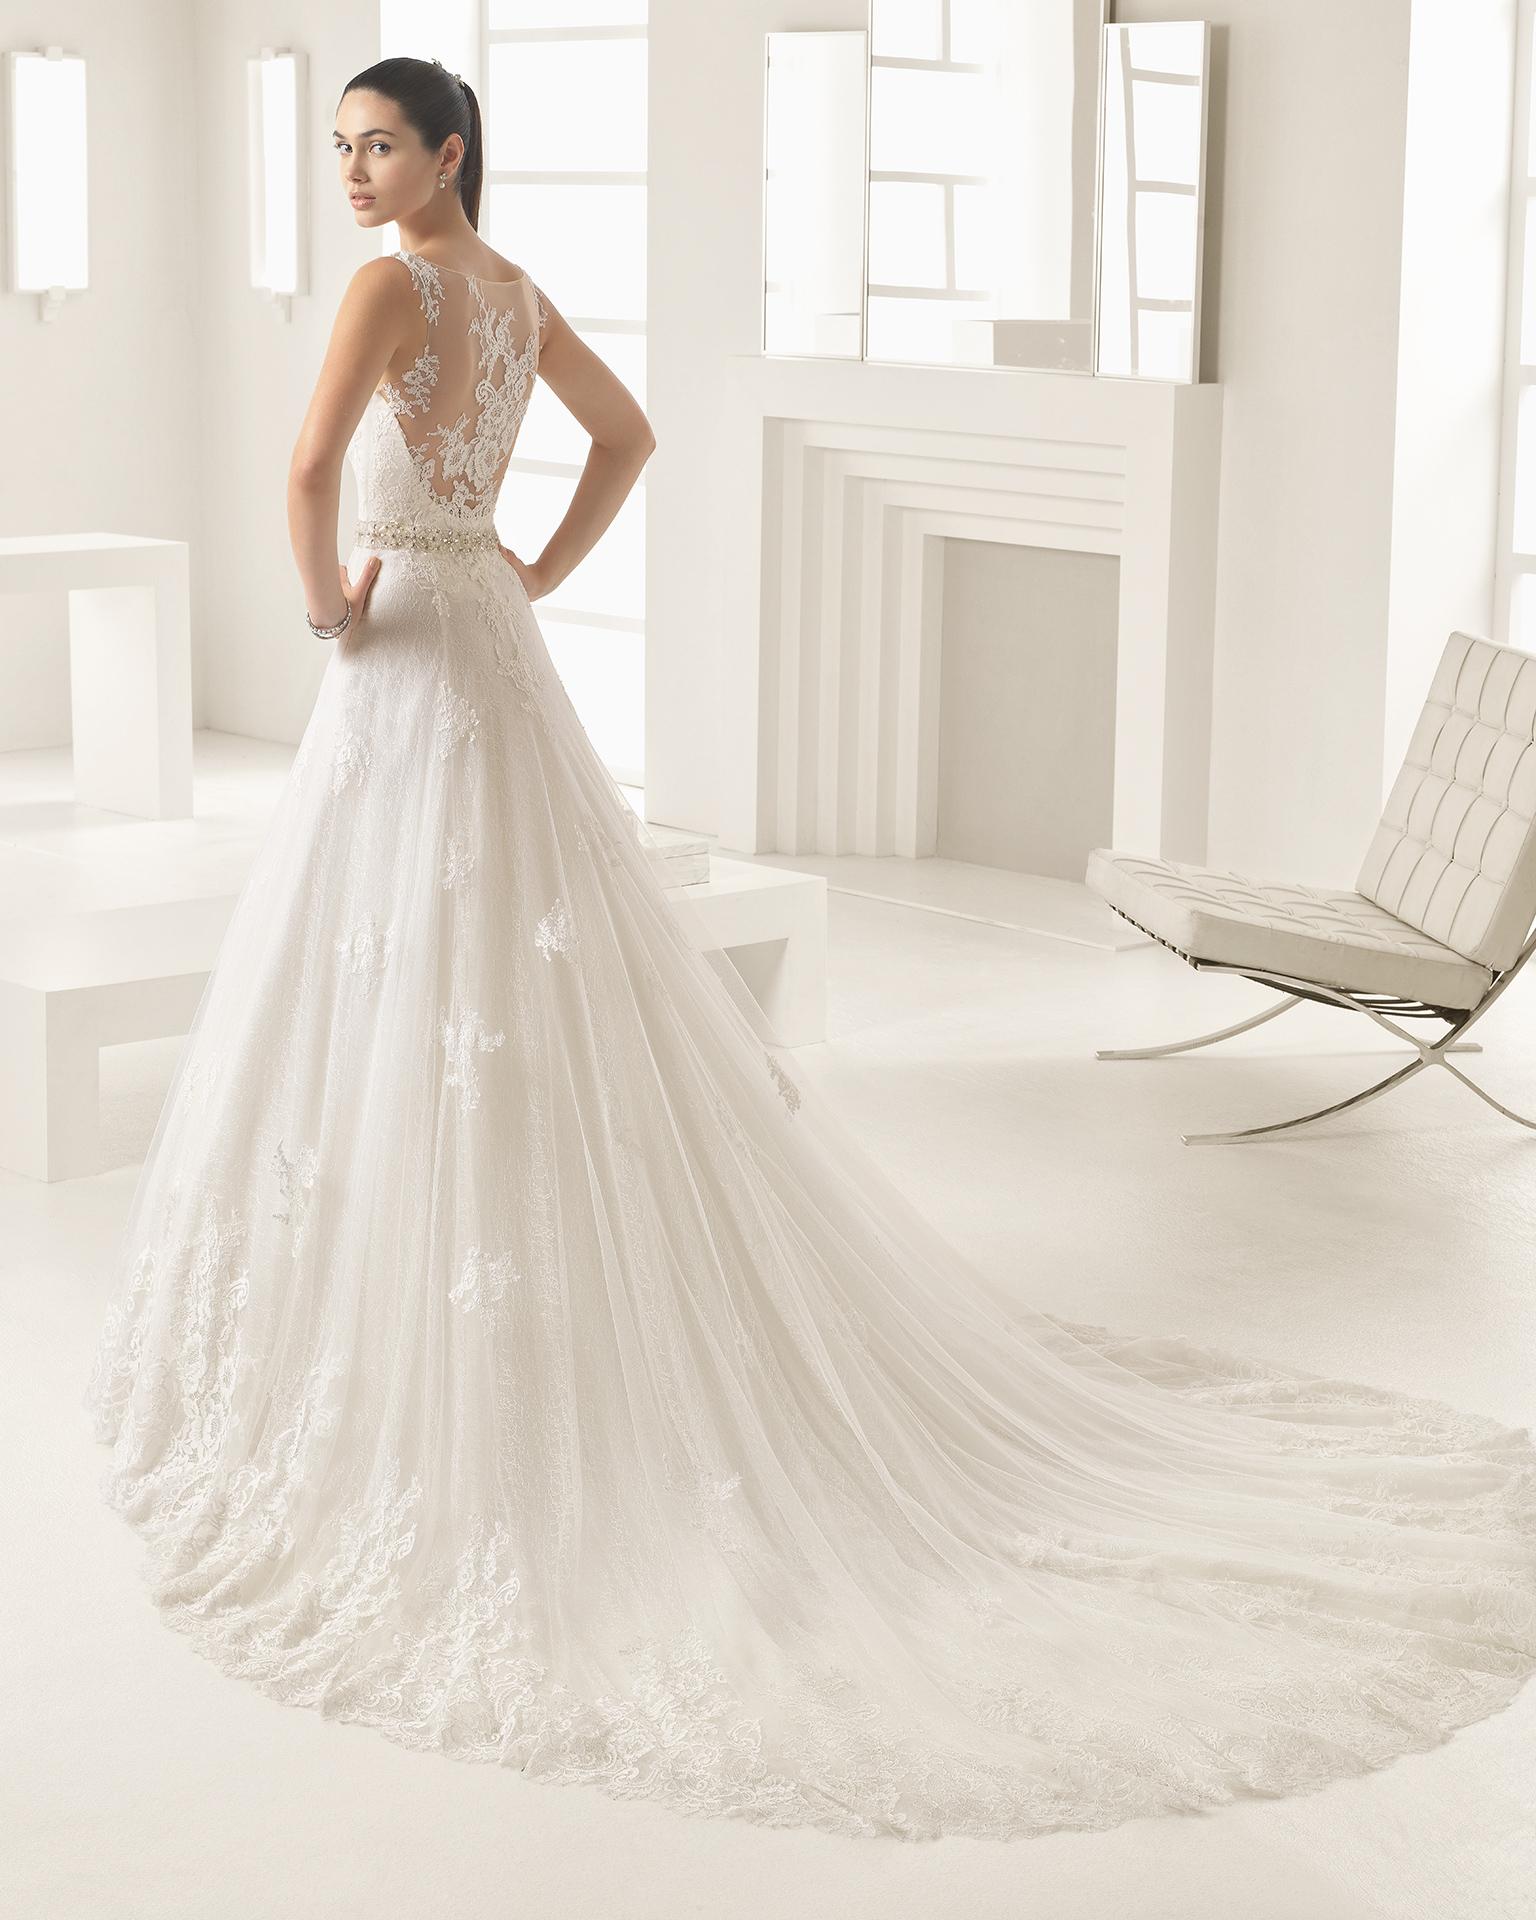 oden 2017 bridal collection rosa clar two. Black Bedroom Furniture Sets. Home Design Ideas